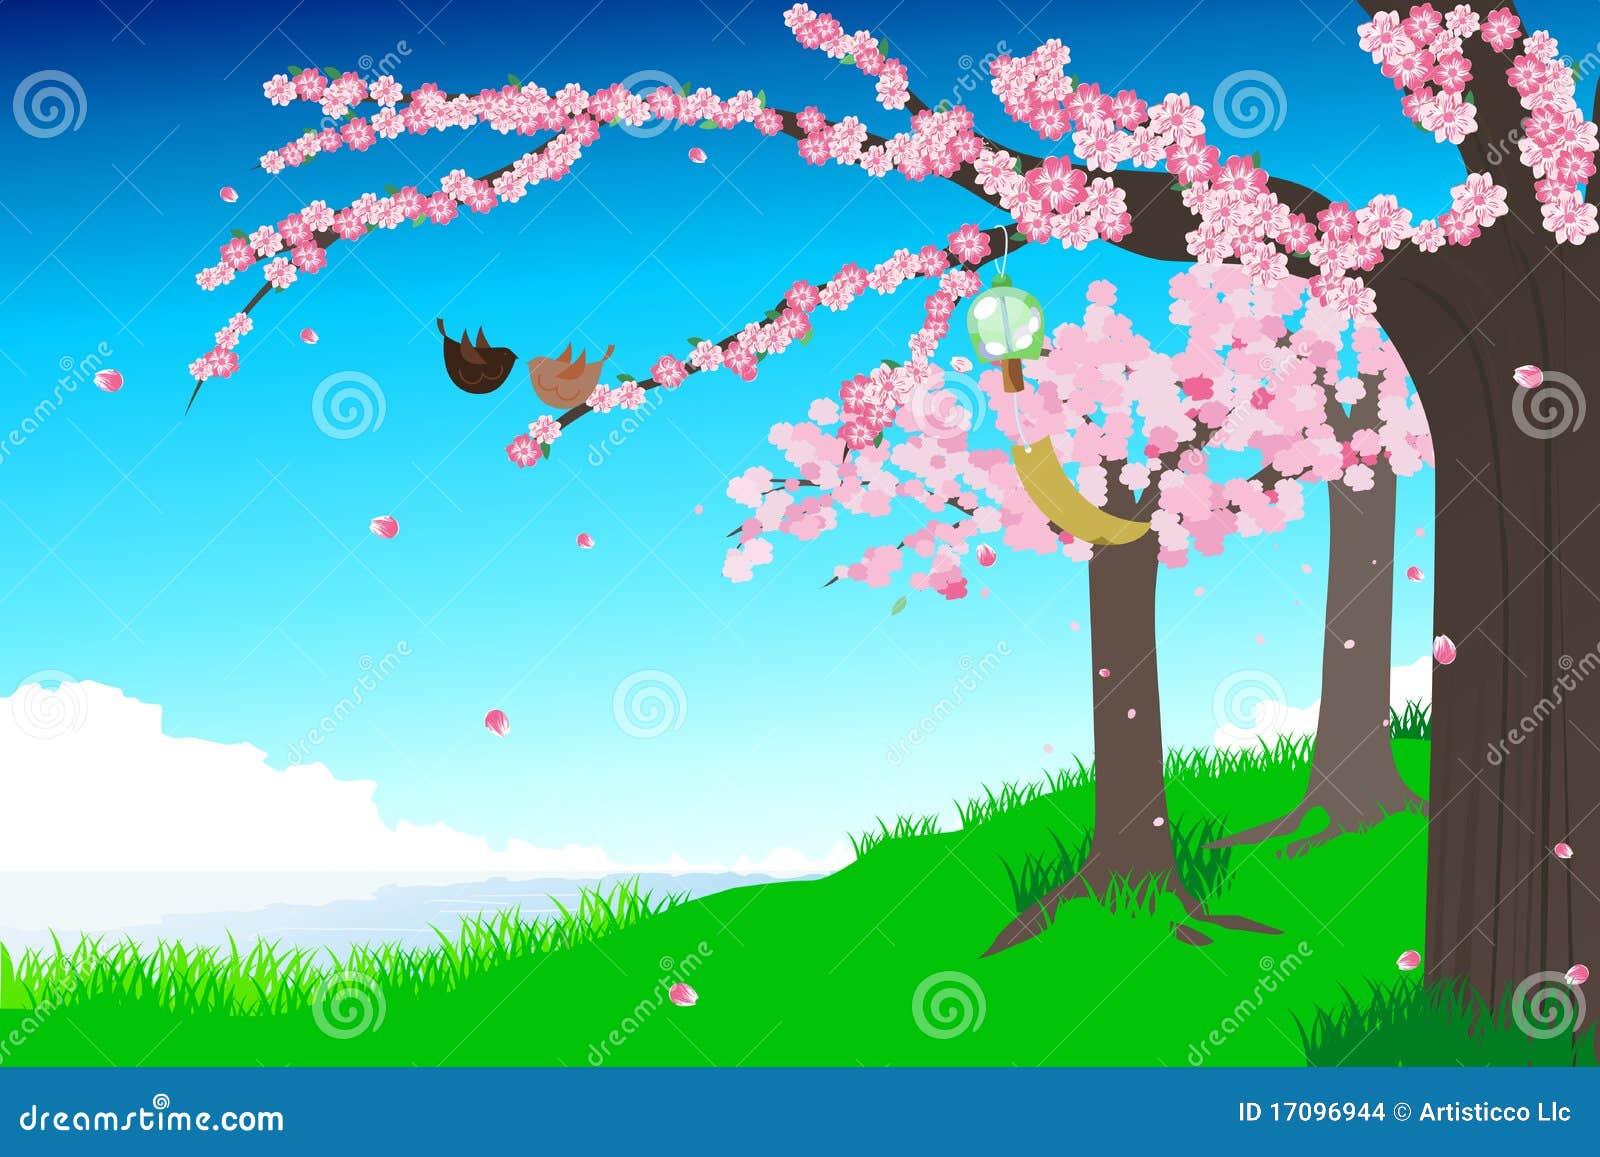 Kirschblütenabbildung